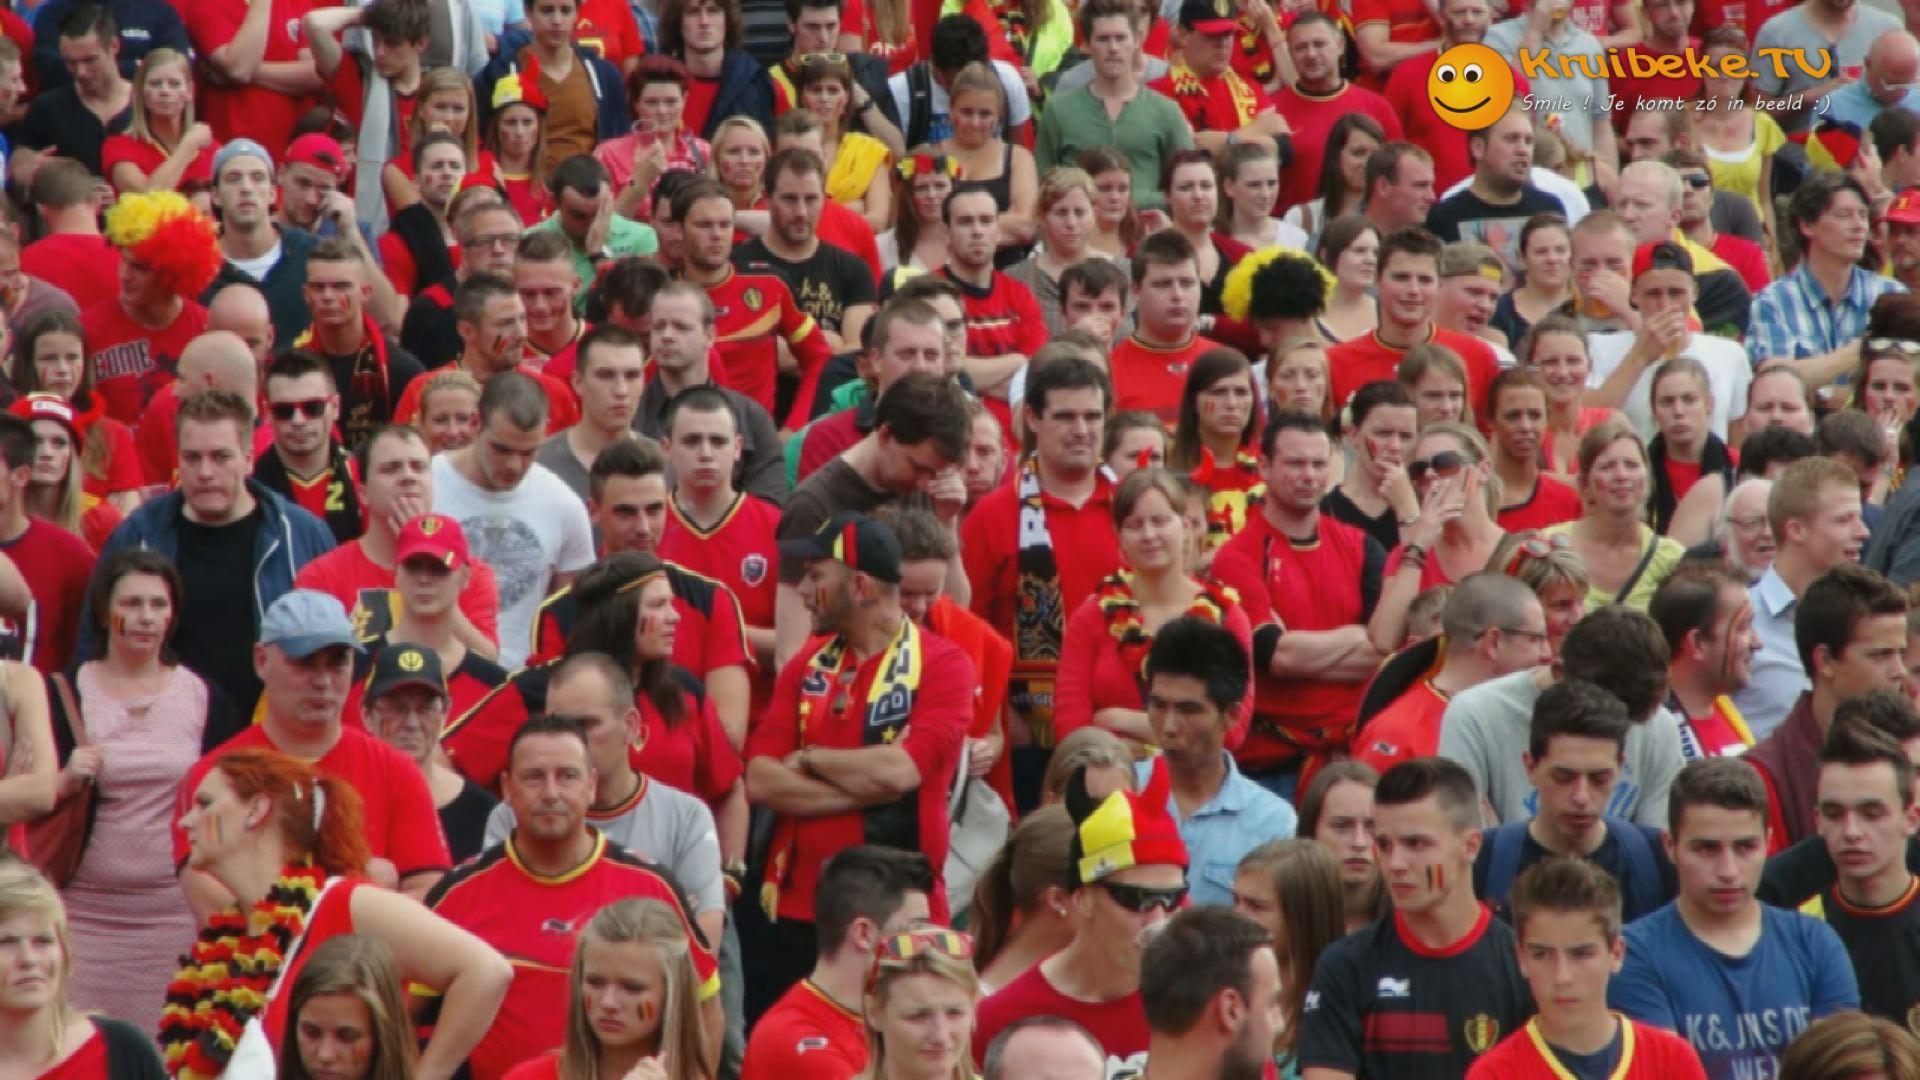 België – Argentinië in Kruibeke